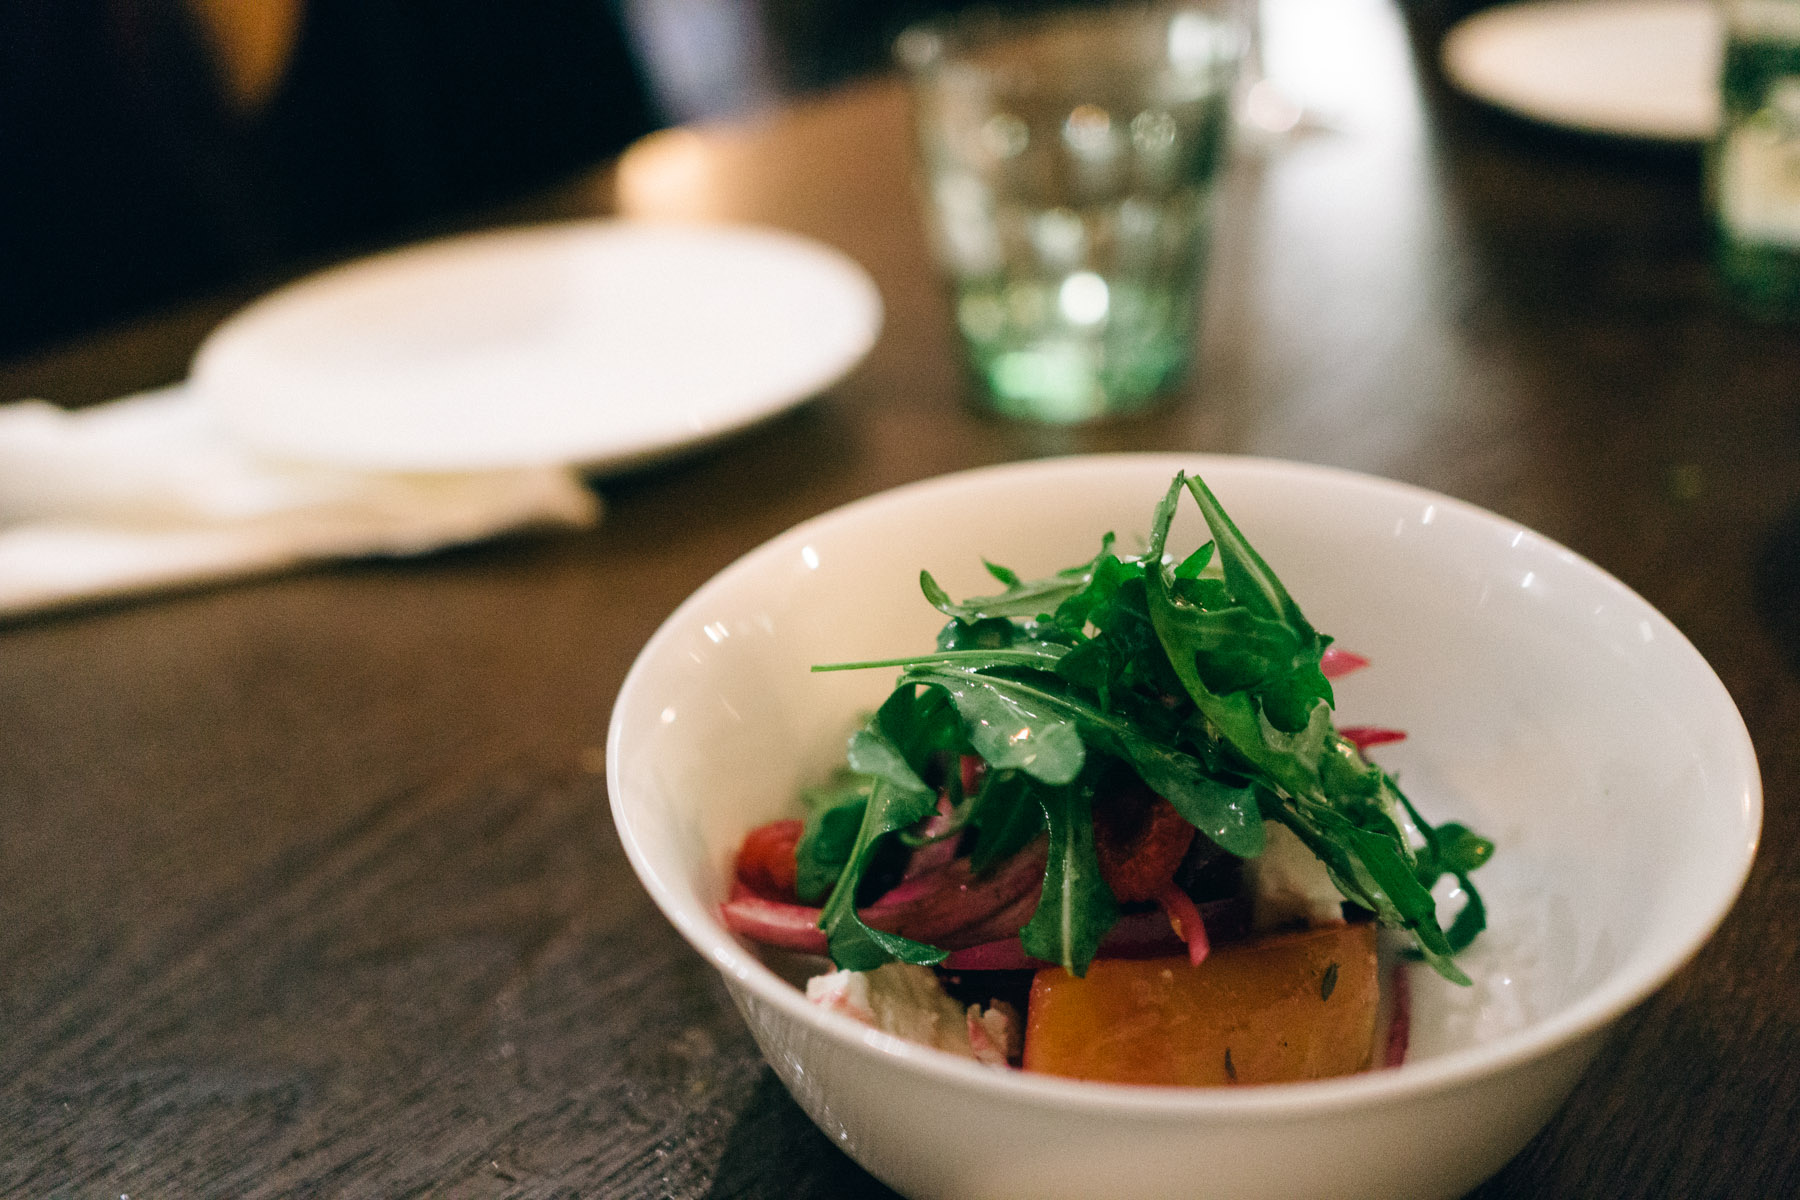 ham-and-sherry-spanish-tapas-ship-street-wan-chai-hong-kong-jason-atherton-26